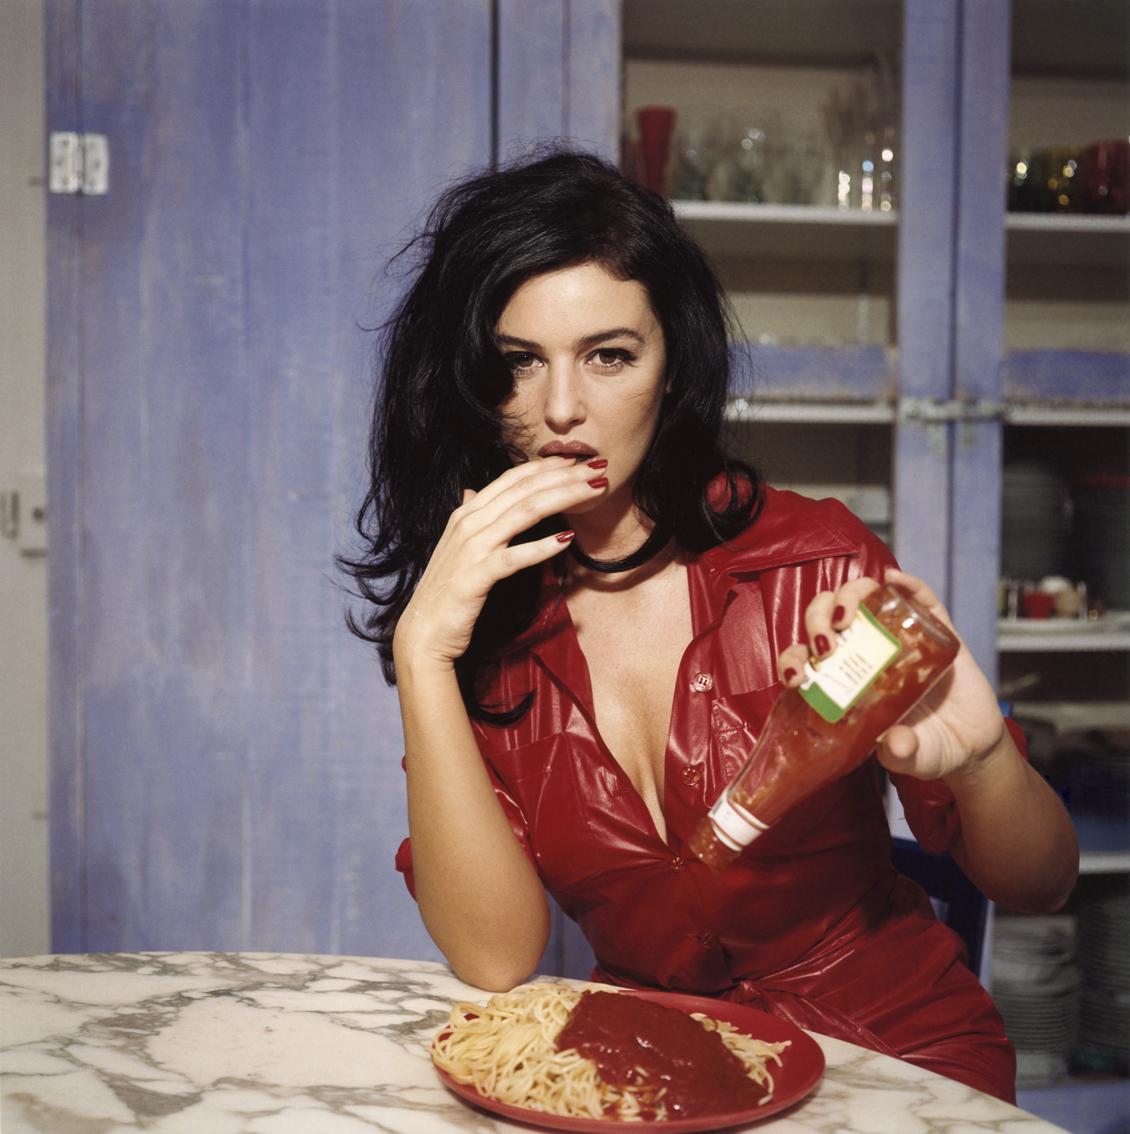 http://3.bp.blogspot.com/-z-frIcoR0-U/T1aiPrnlkyI/AAAAAAAAhcs/6LpdPtN_FzQ/s1600/Breakfast-with-Monica-Bellucci-Novembre-1995-Paris.jpeg